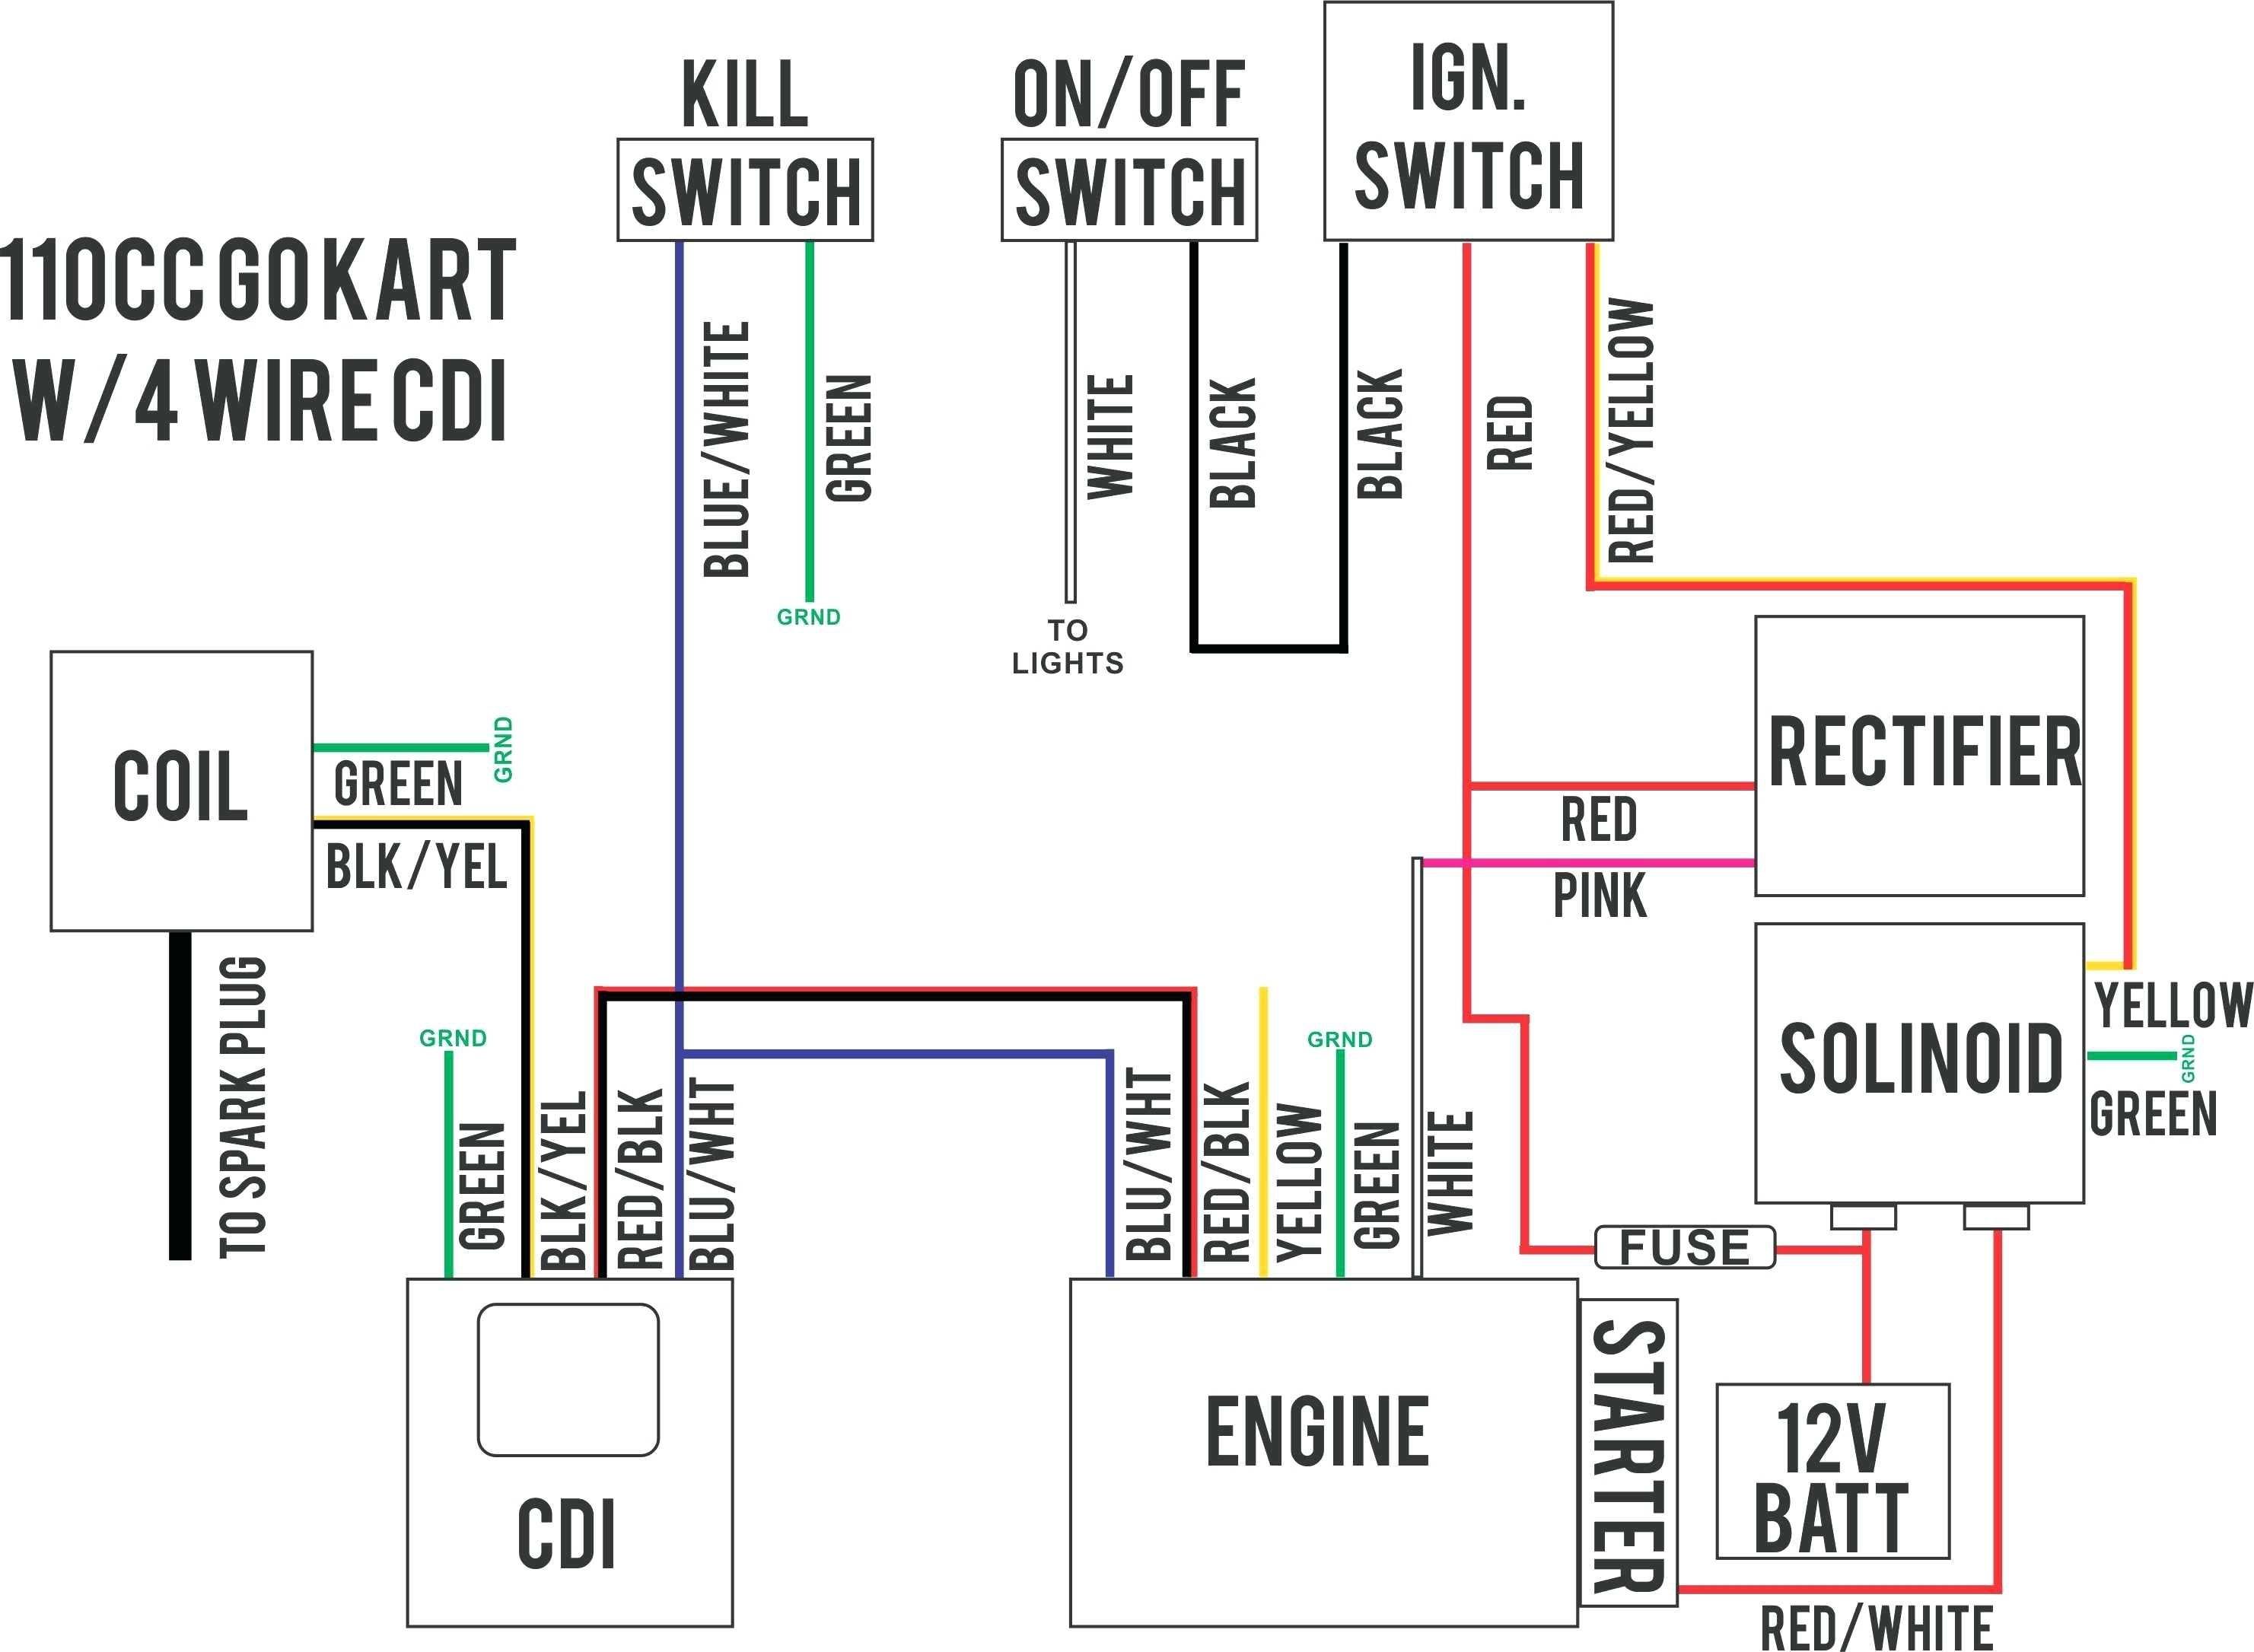 Atv Turn Signal Wiring Diagram Go Kart Wiring Diagram Blog Featuring the Wiring Diagram Of Atv Turn Signal Wiring Diagram